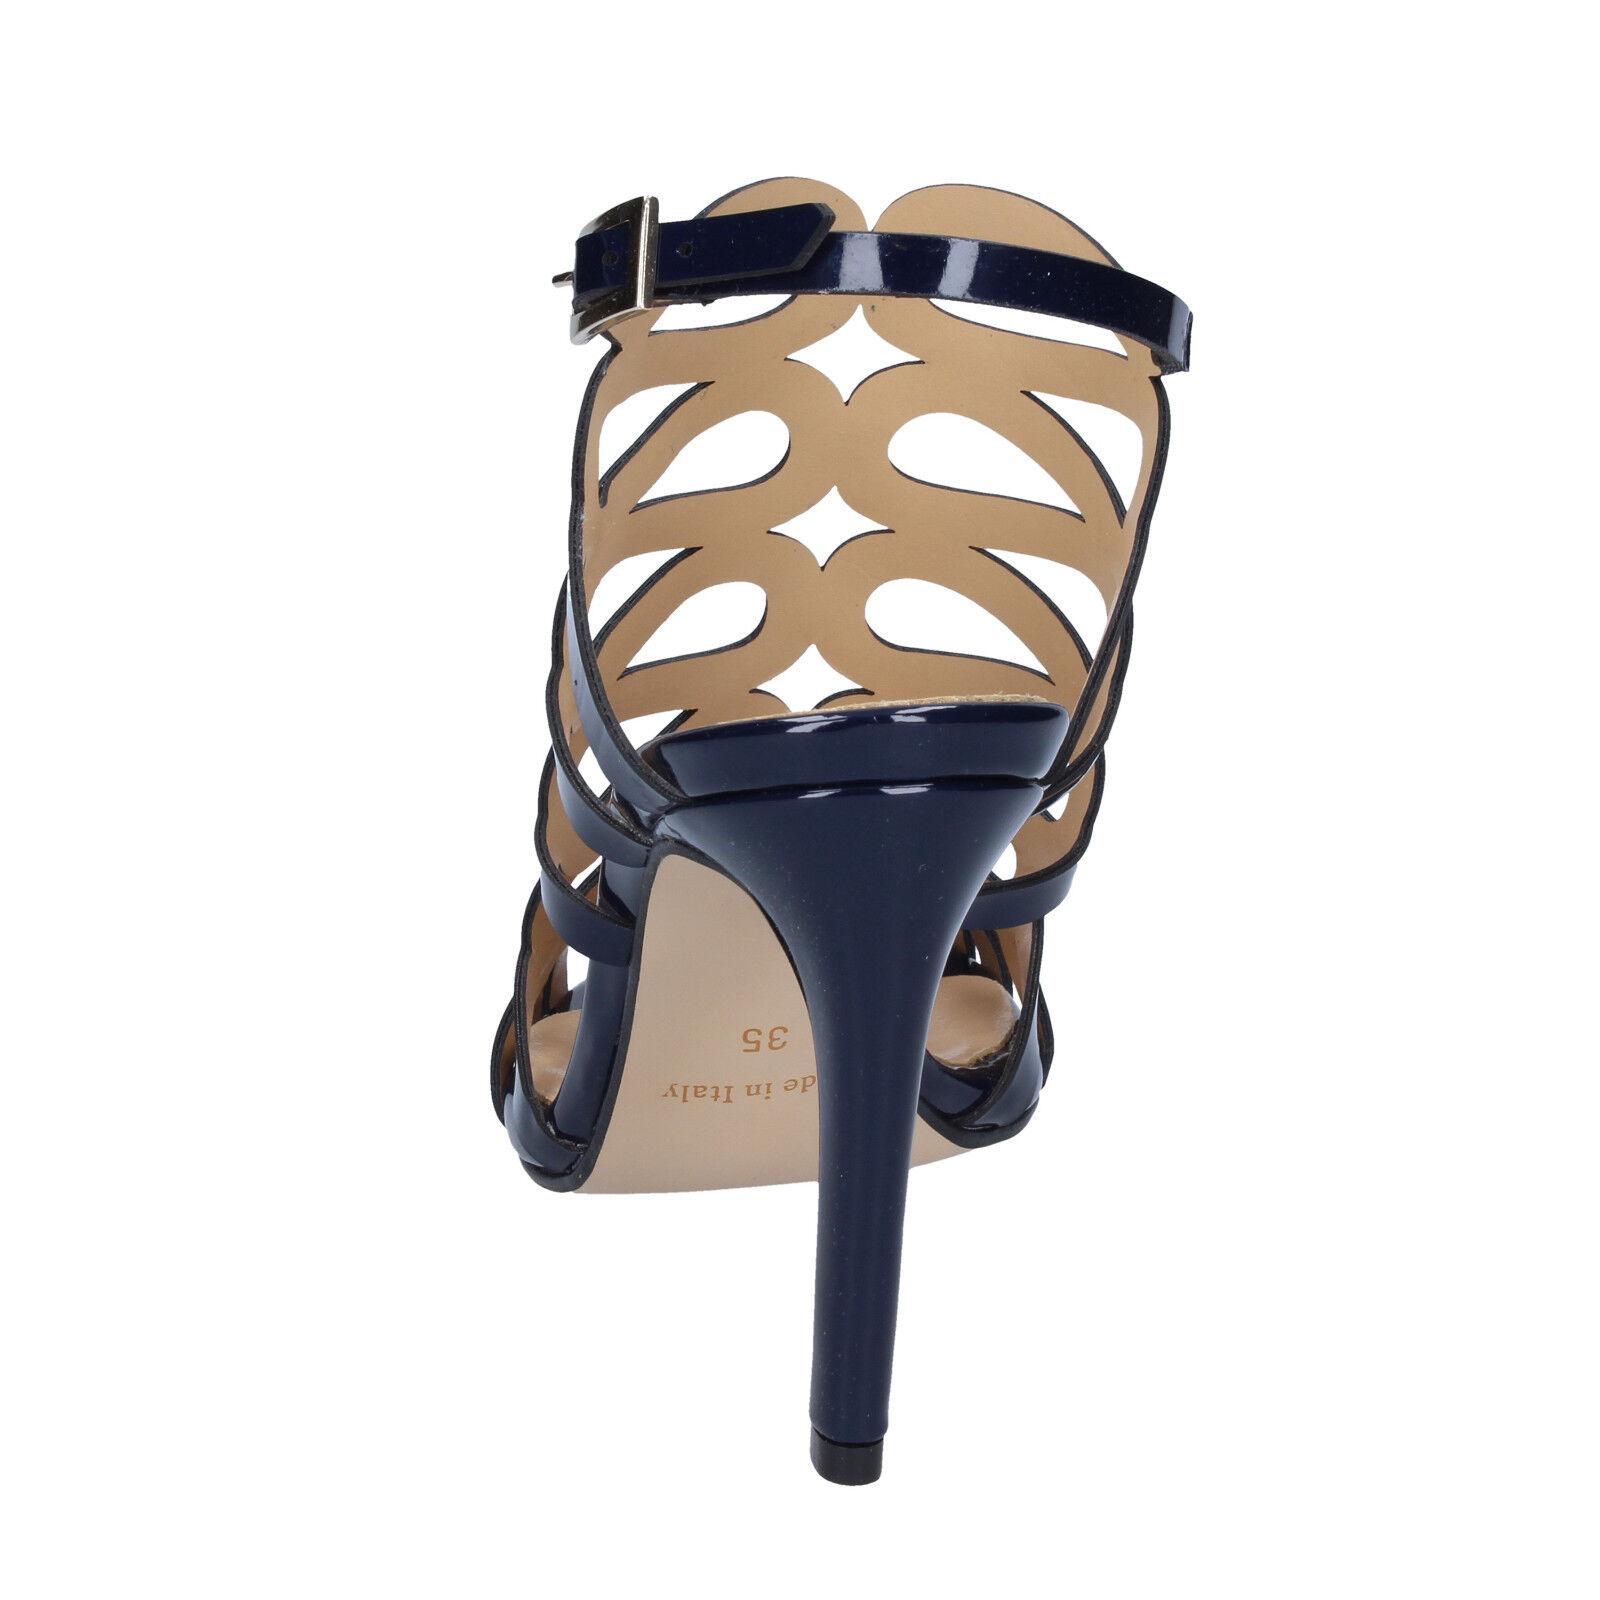 Zapatos señora olga Burini 39 UE sandalias azul charol charol charol bs91-39 847ba8